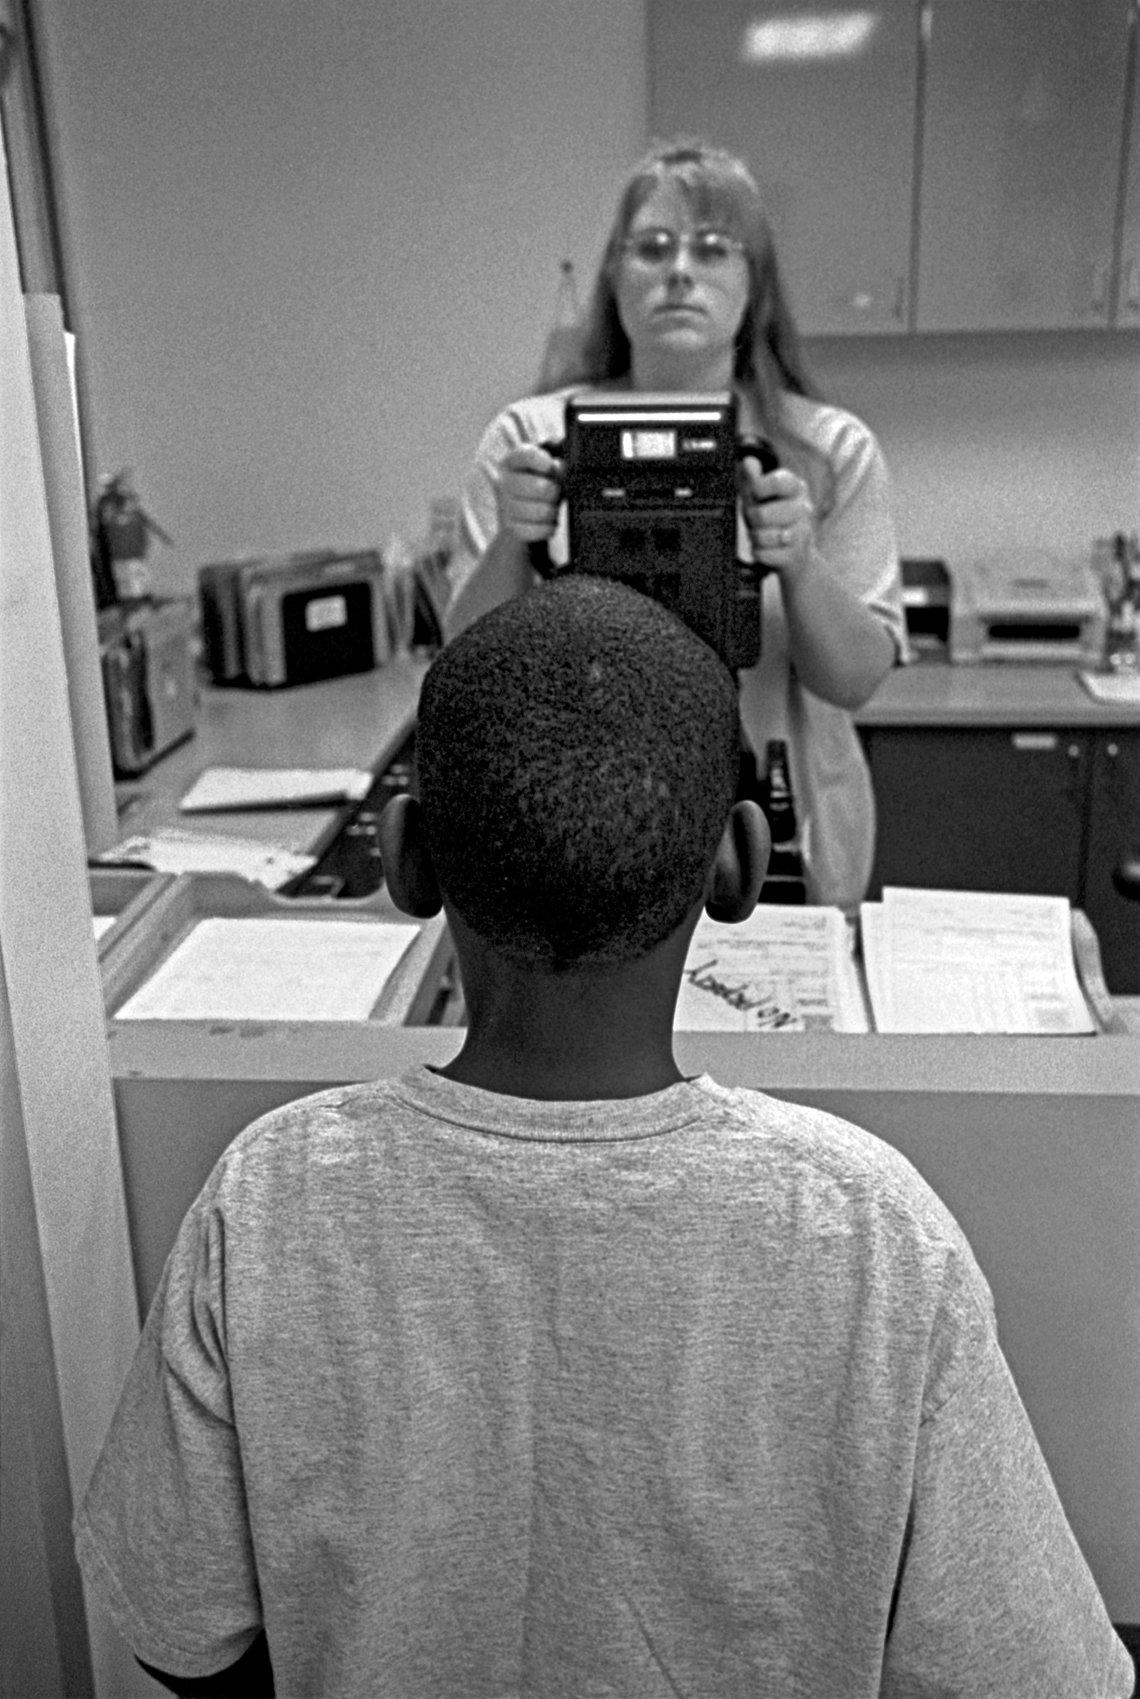 A 12-year-old boy photographed at the receiving department of Santa Clara Juvenile Hall. (San Jose, 1999)